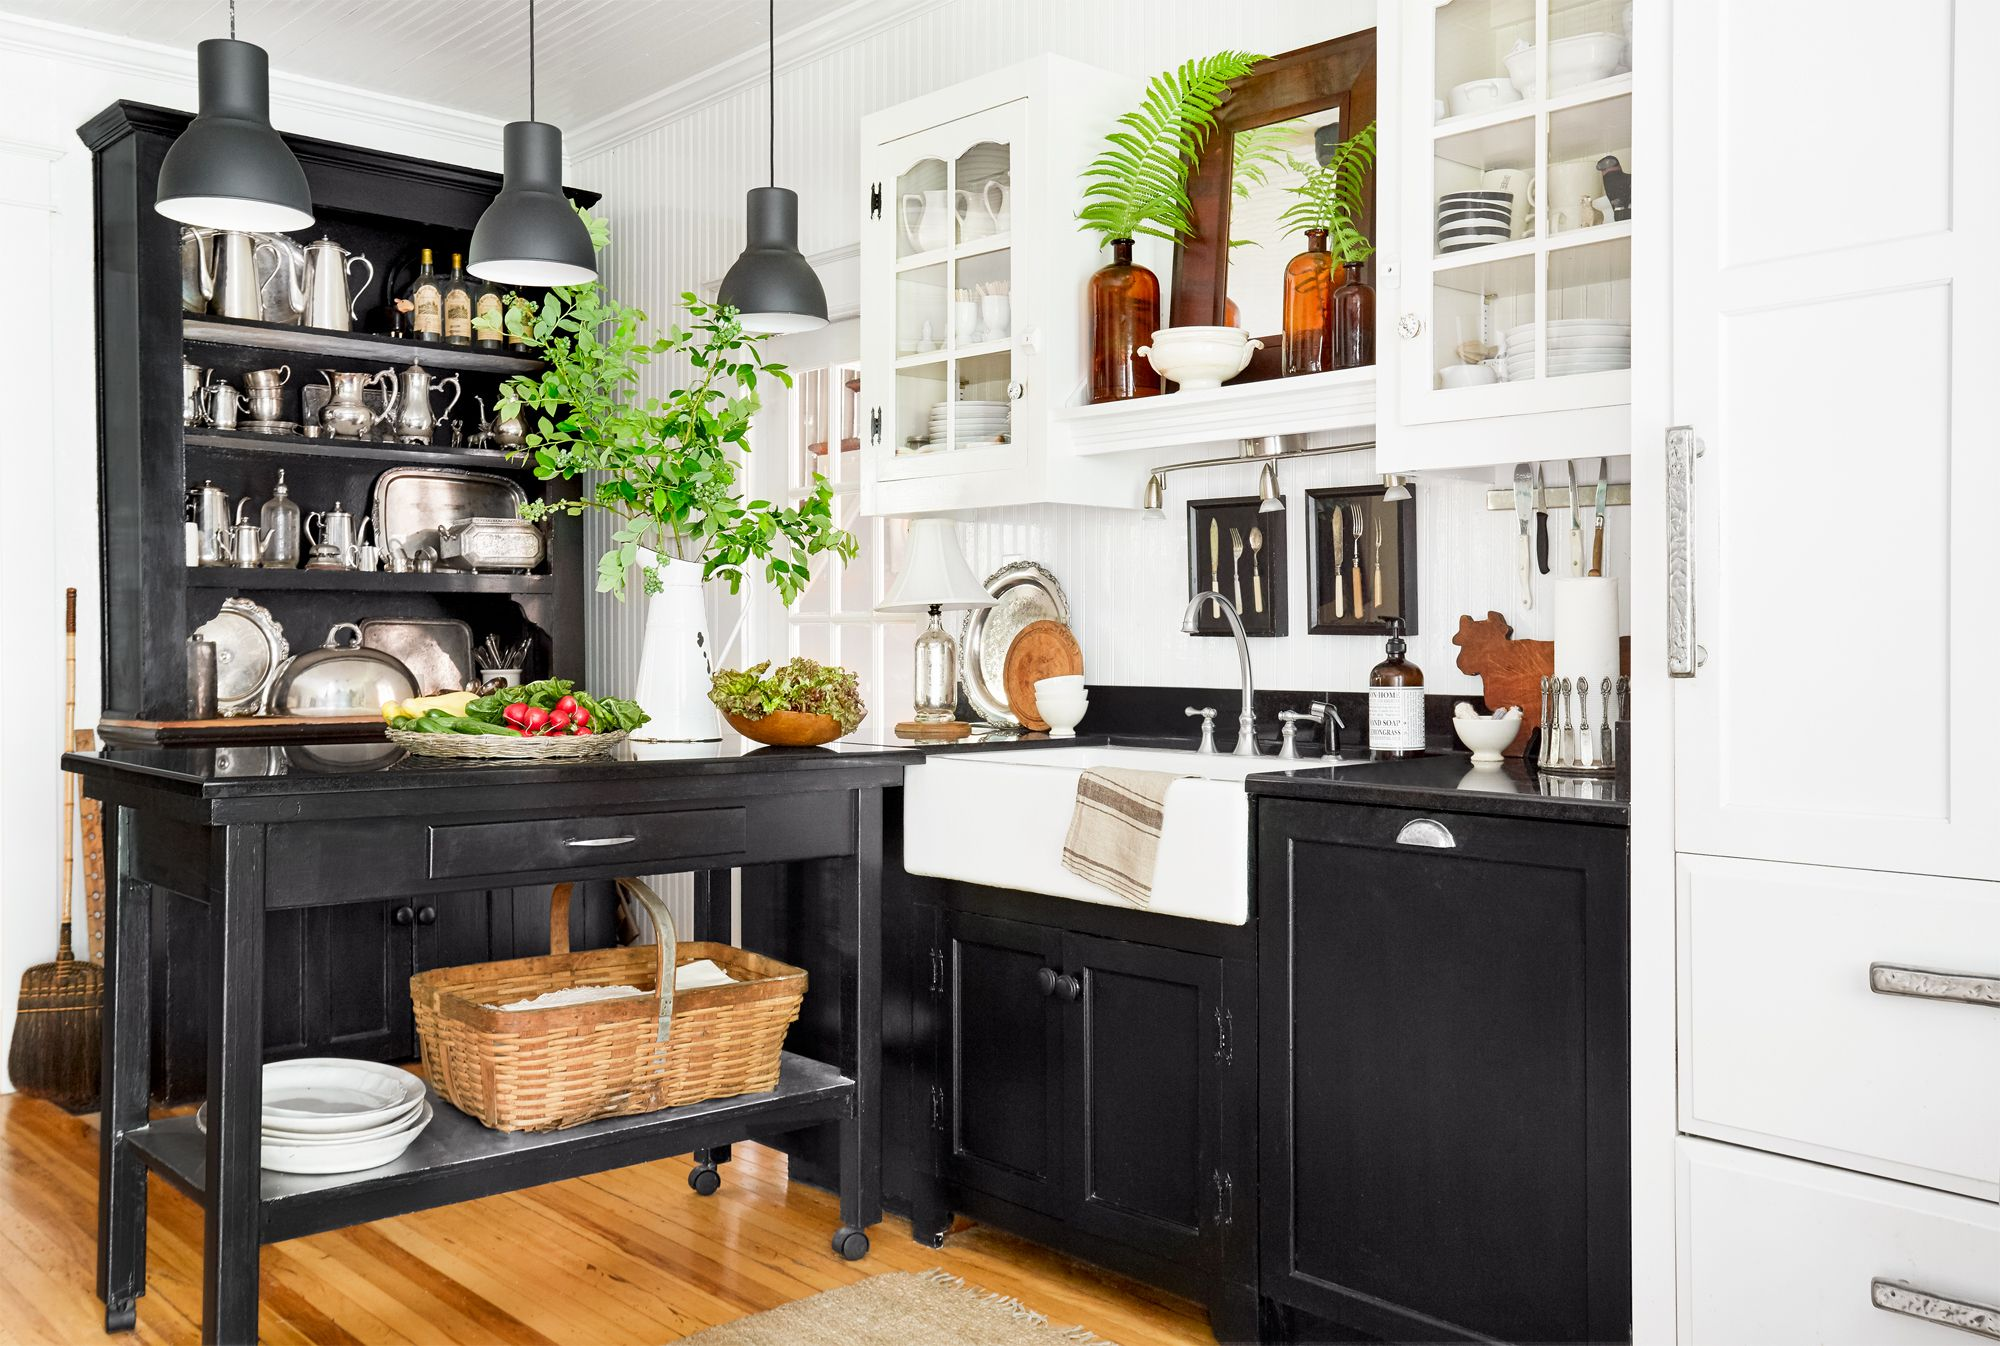 34 Farmhouse Style Kitchens   Rustic Decor Ideas for Kitchens 2000x1346